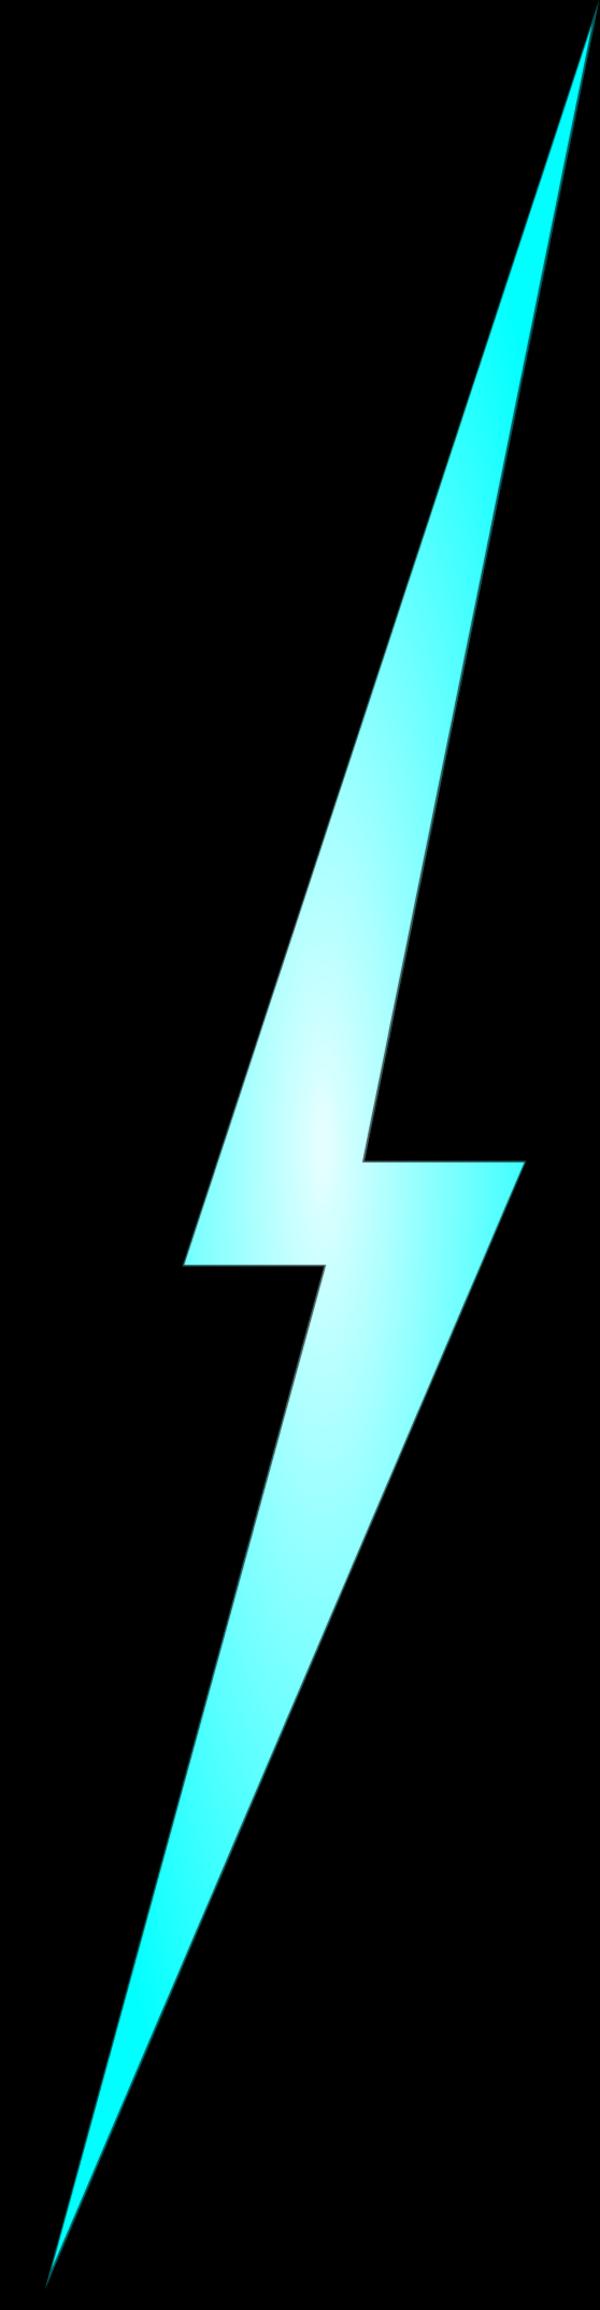 Lighting electrical power symbol